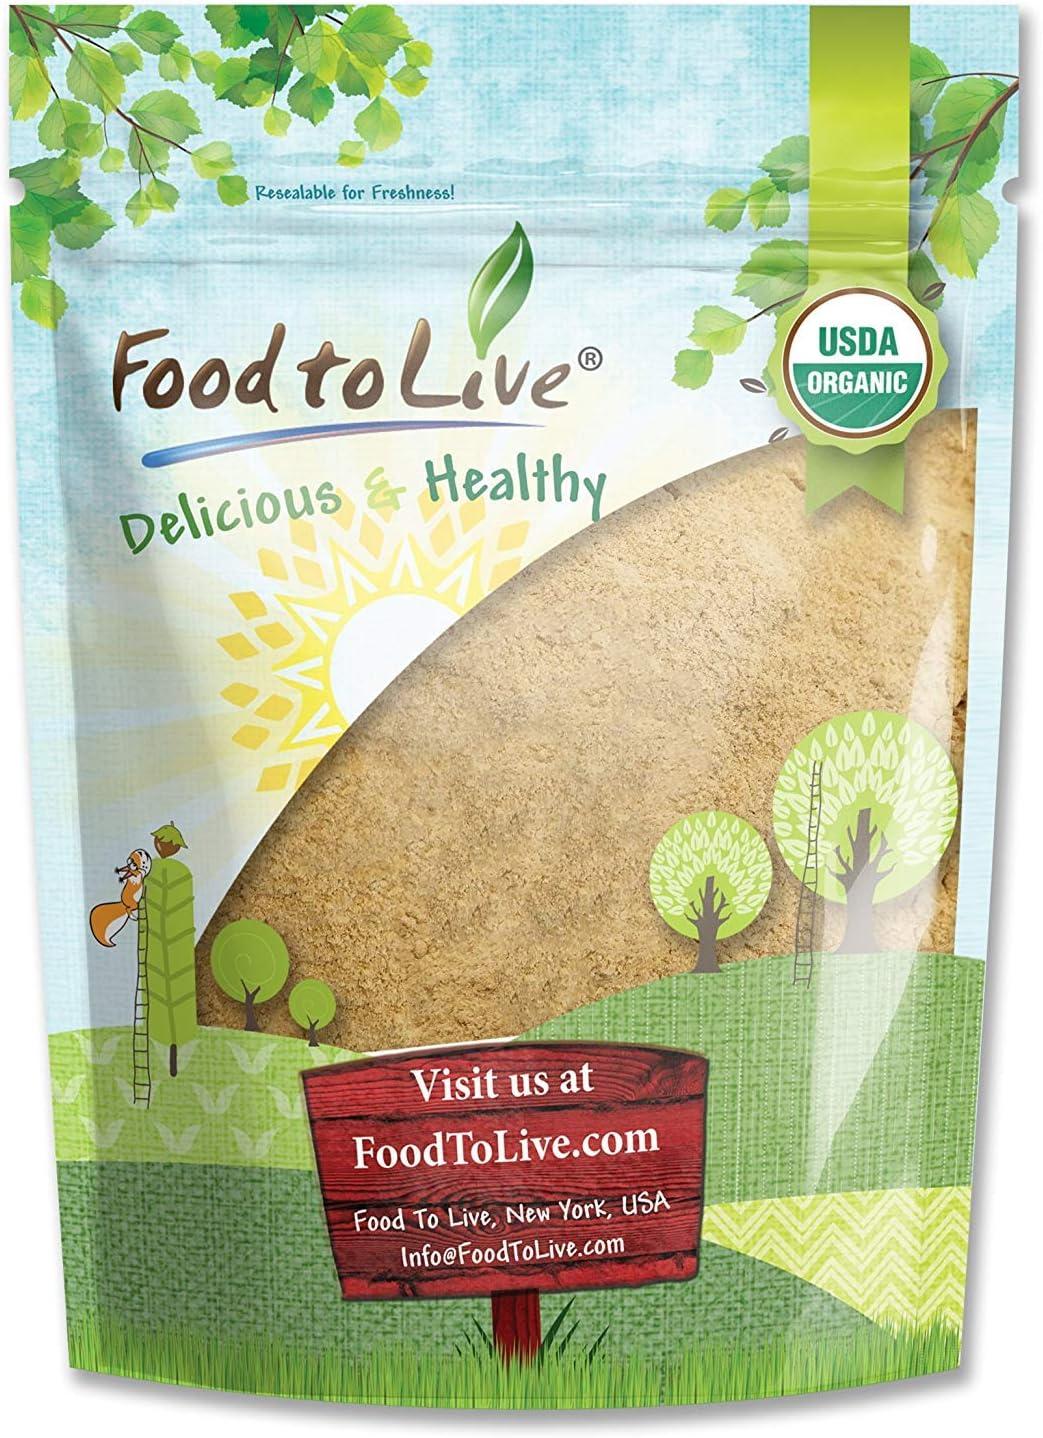 Organic Maca Powder, 2 Pounds - Gelatinized, Non-GMO, Kosher, Vegan, Bulk